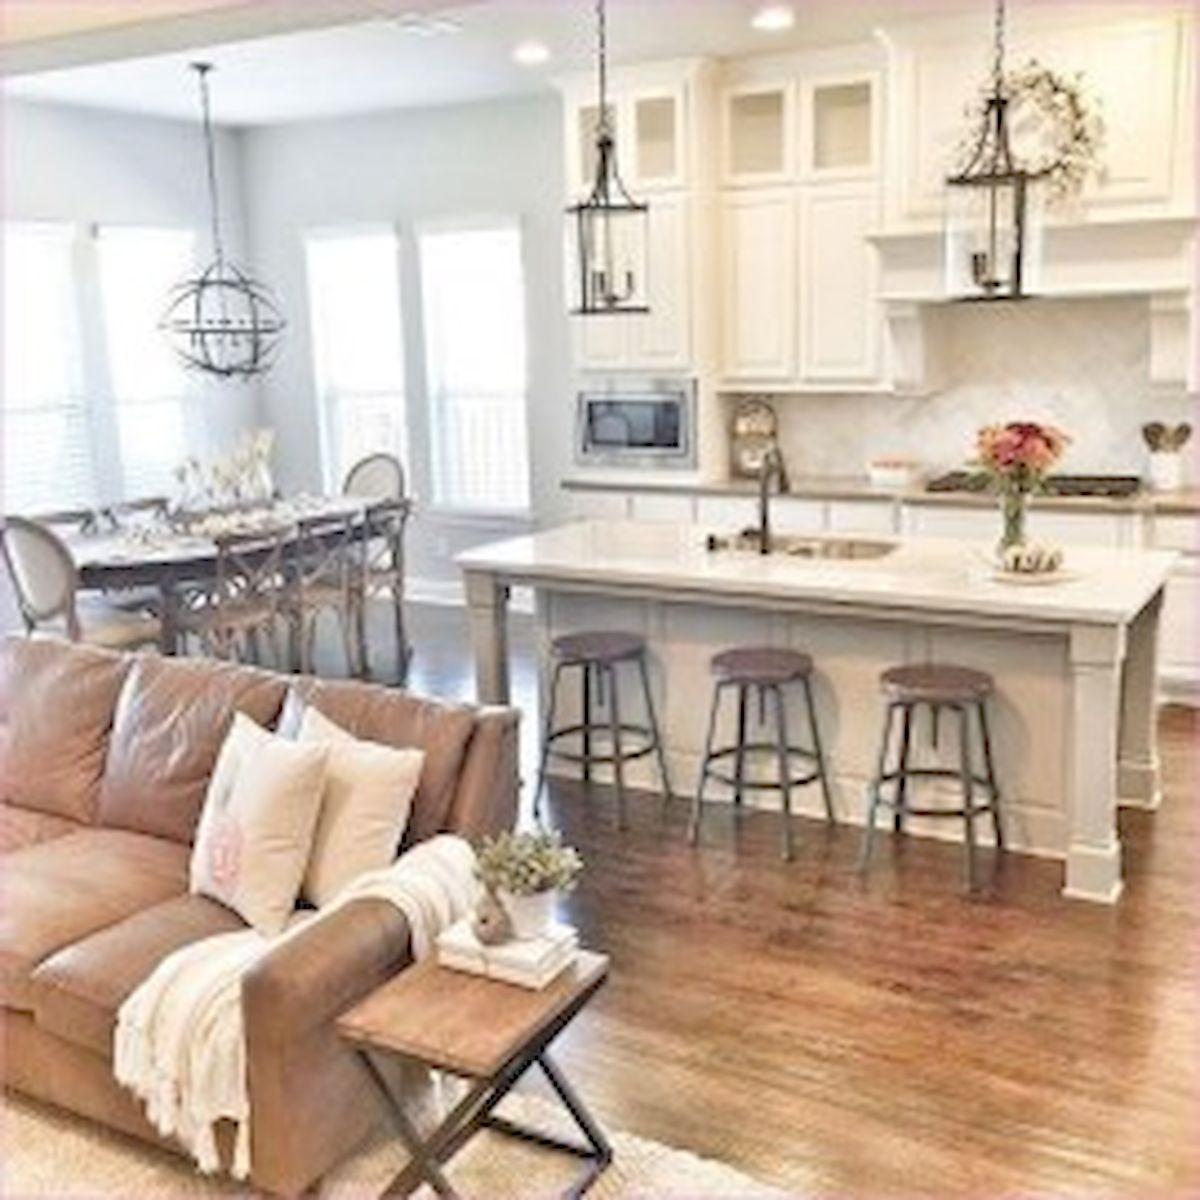 40+ Awesome Farmhouse Design Ideas For Living Room (37)